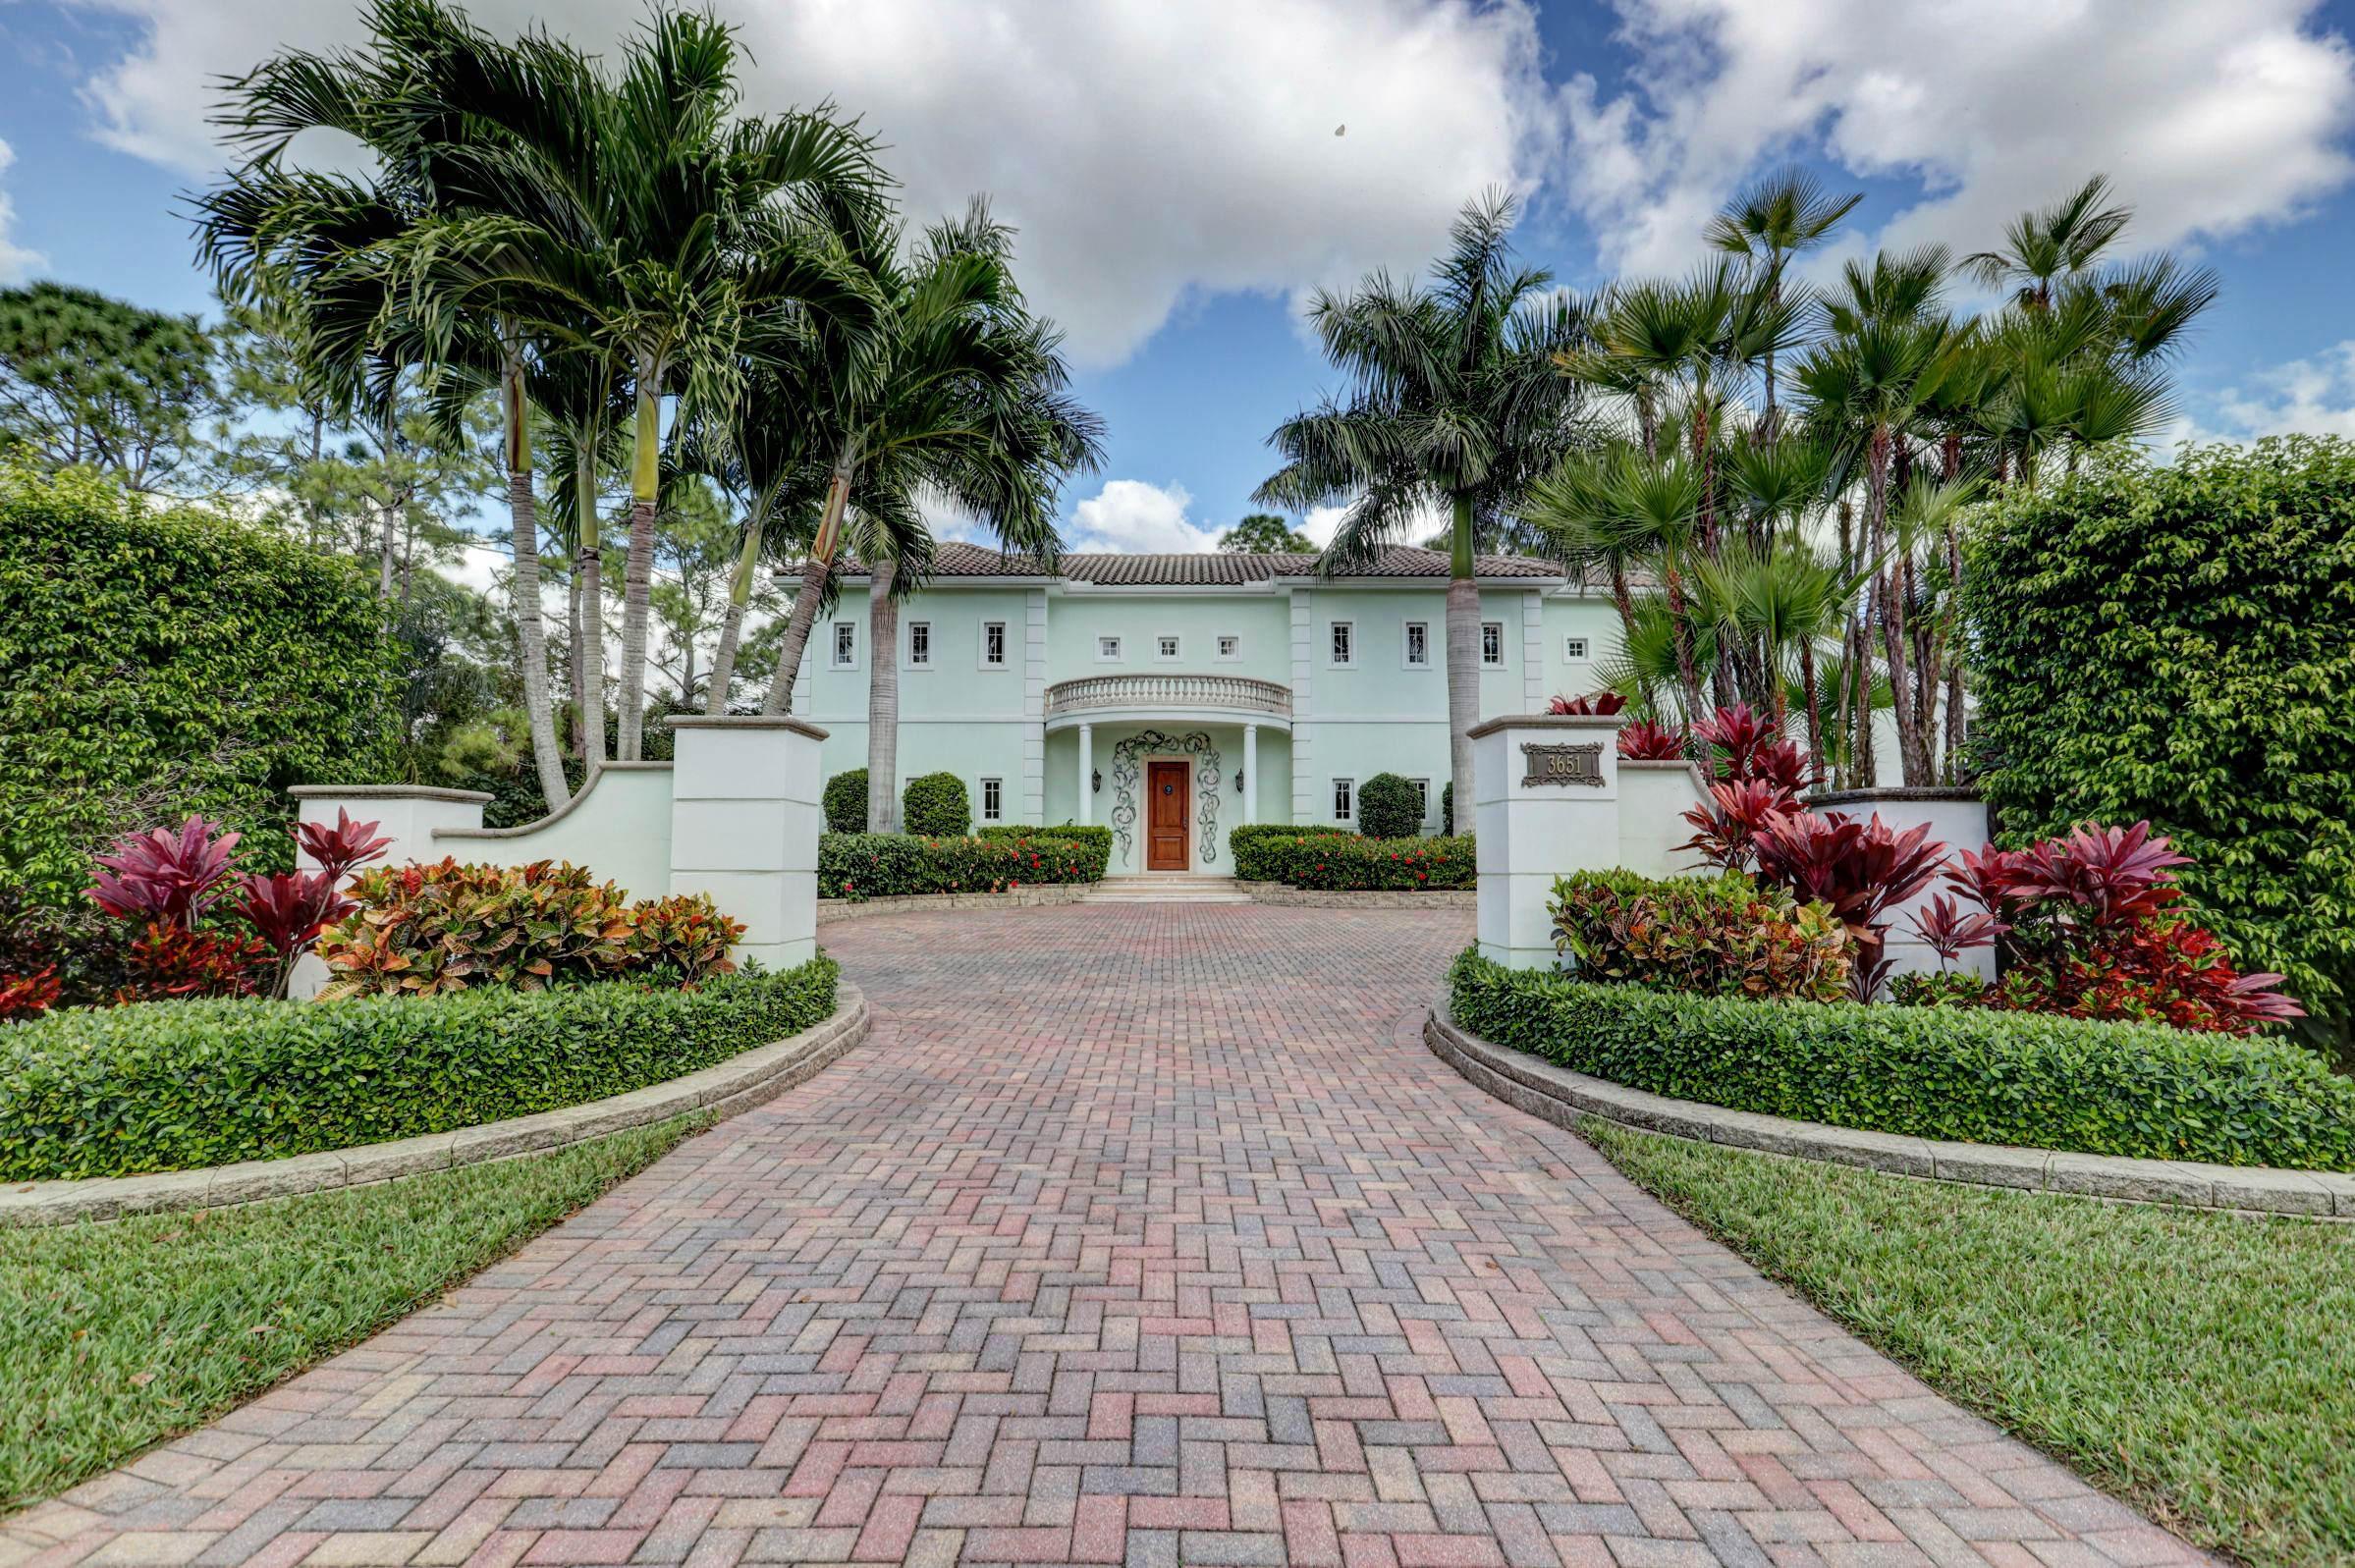 Home for sale in old trail pud ph i & ii Jupiter Florida